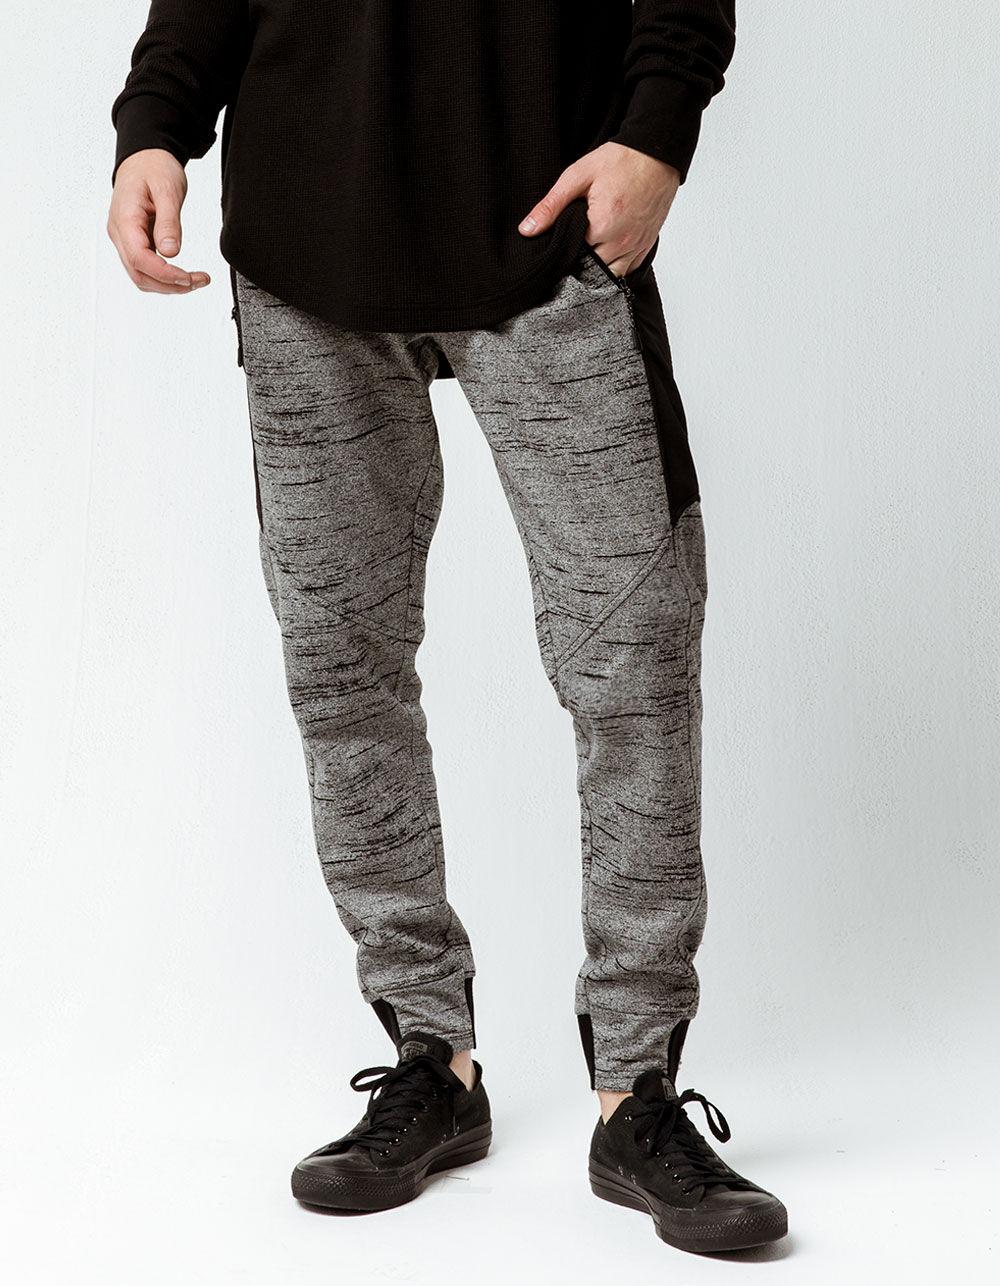 Image of BROOKLYN CLOTH NYLON BLACK STREAK BLACK & GRAY JOGGER PANTS